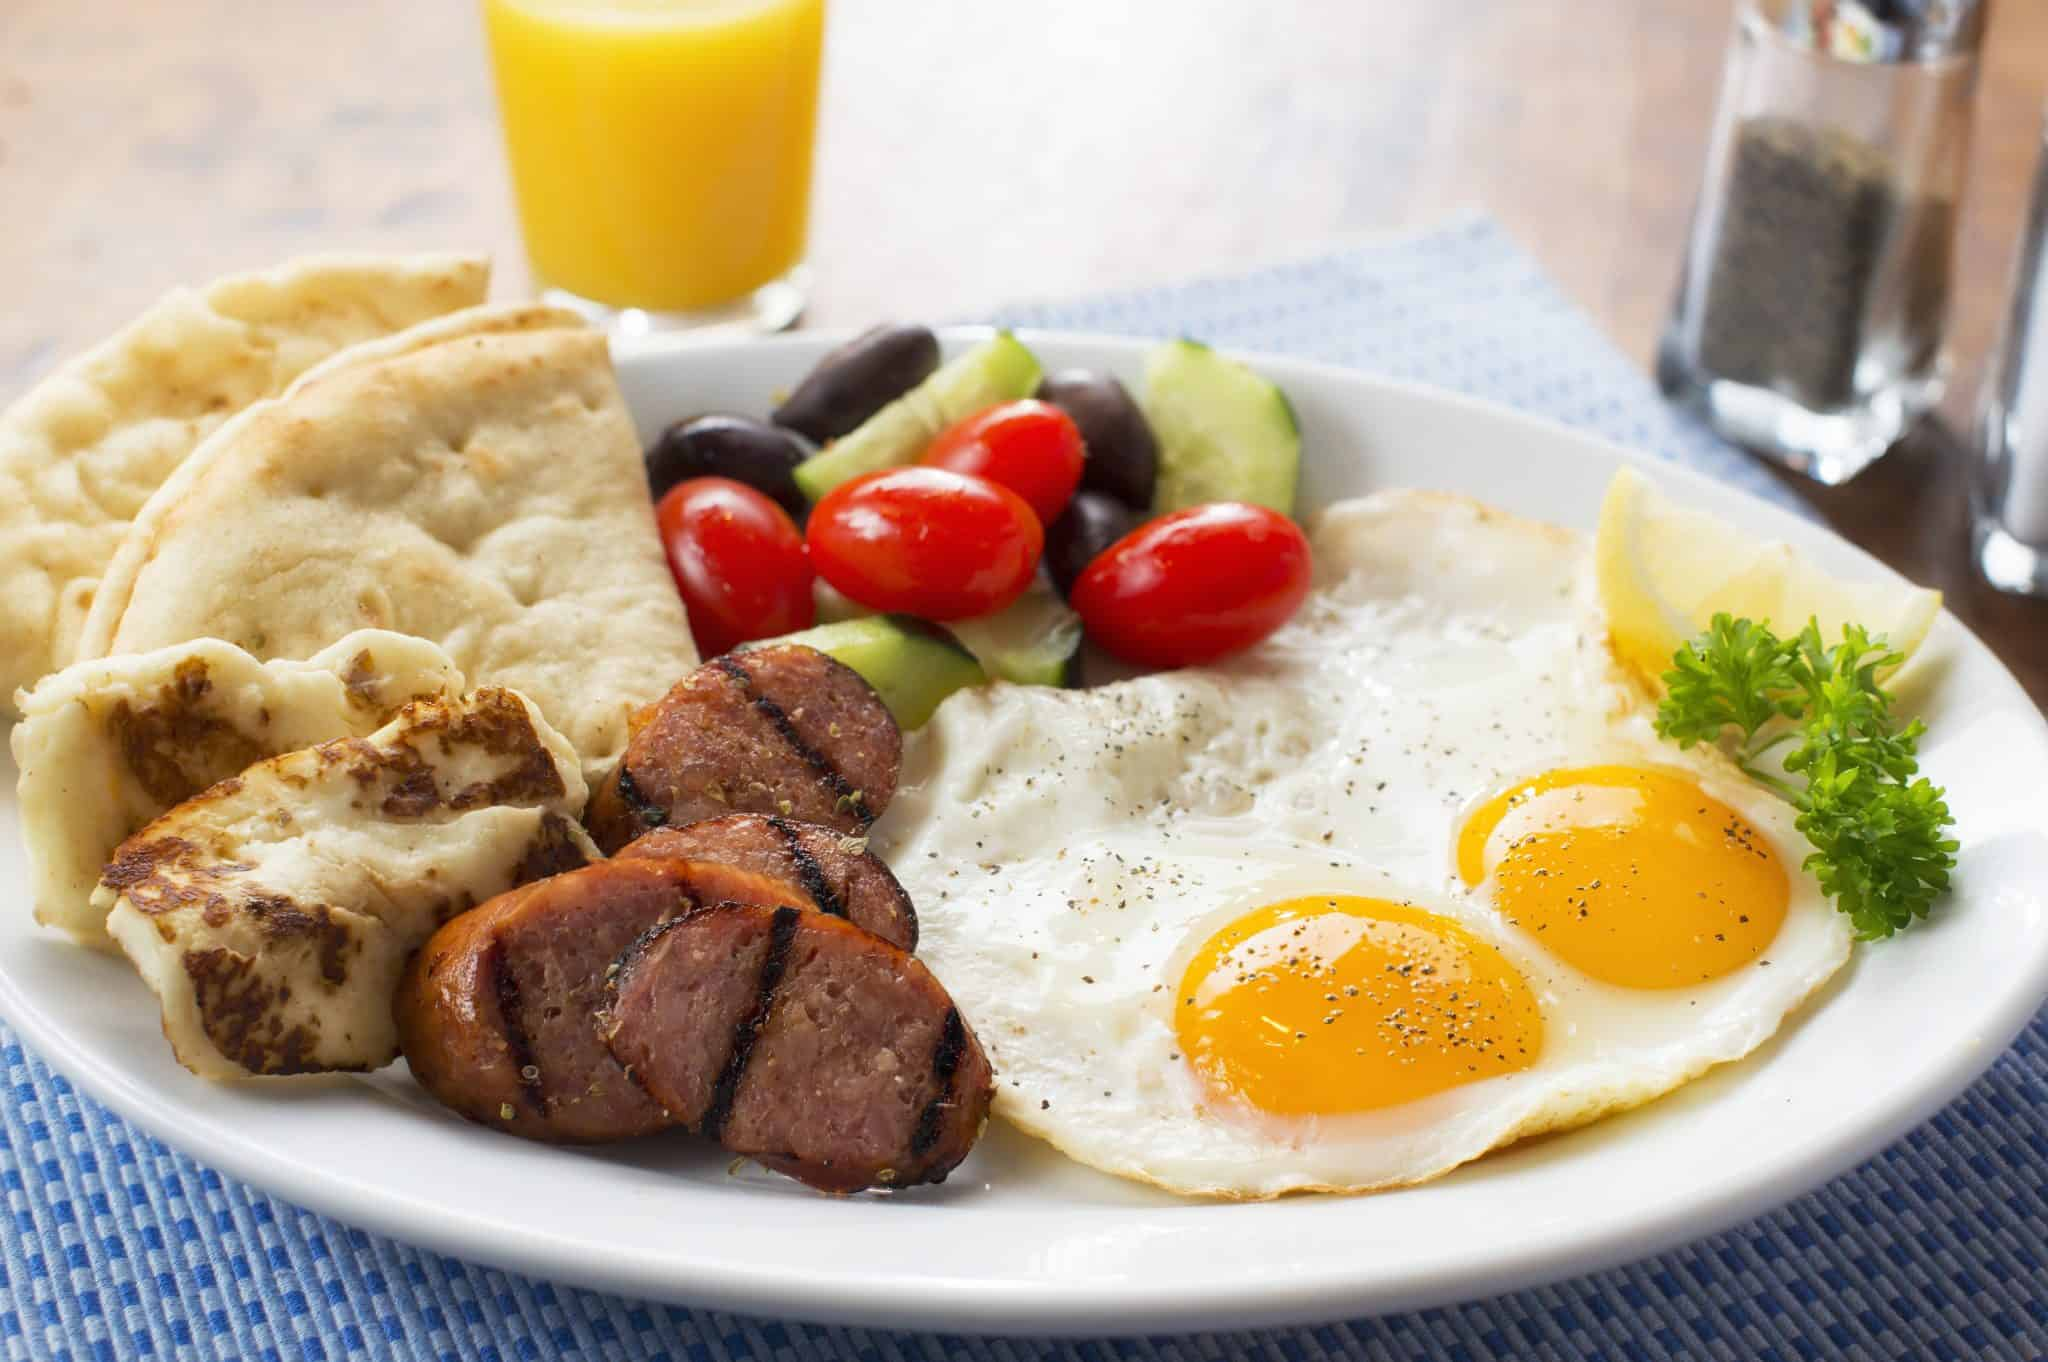 Closest Breakfast Restaurants My Location